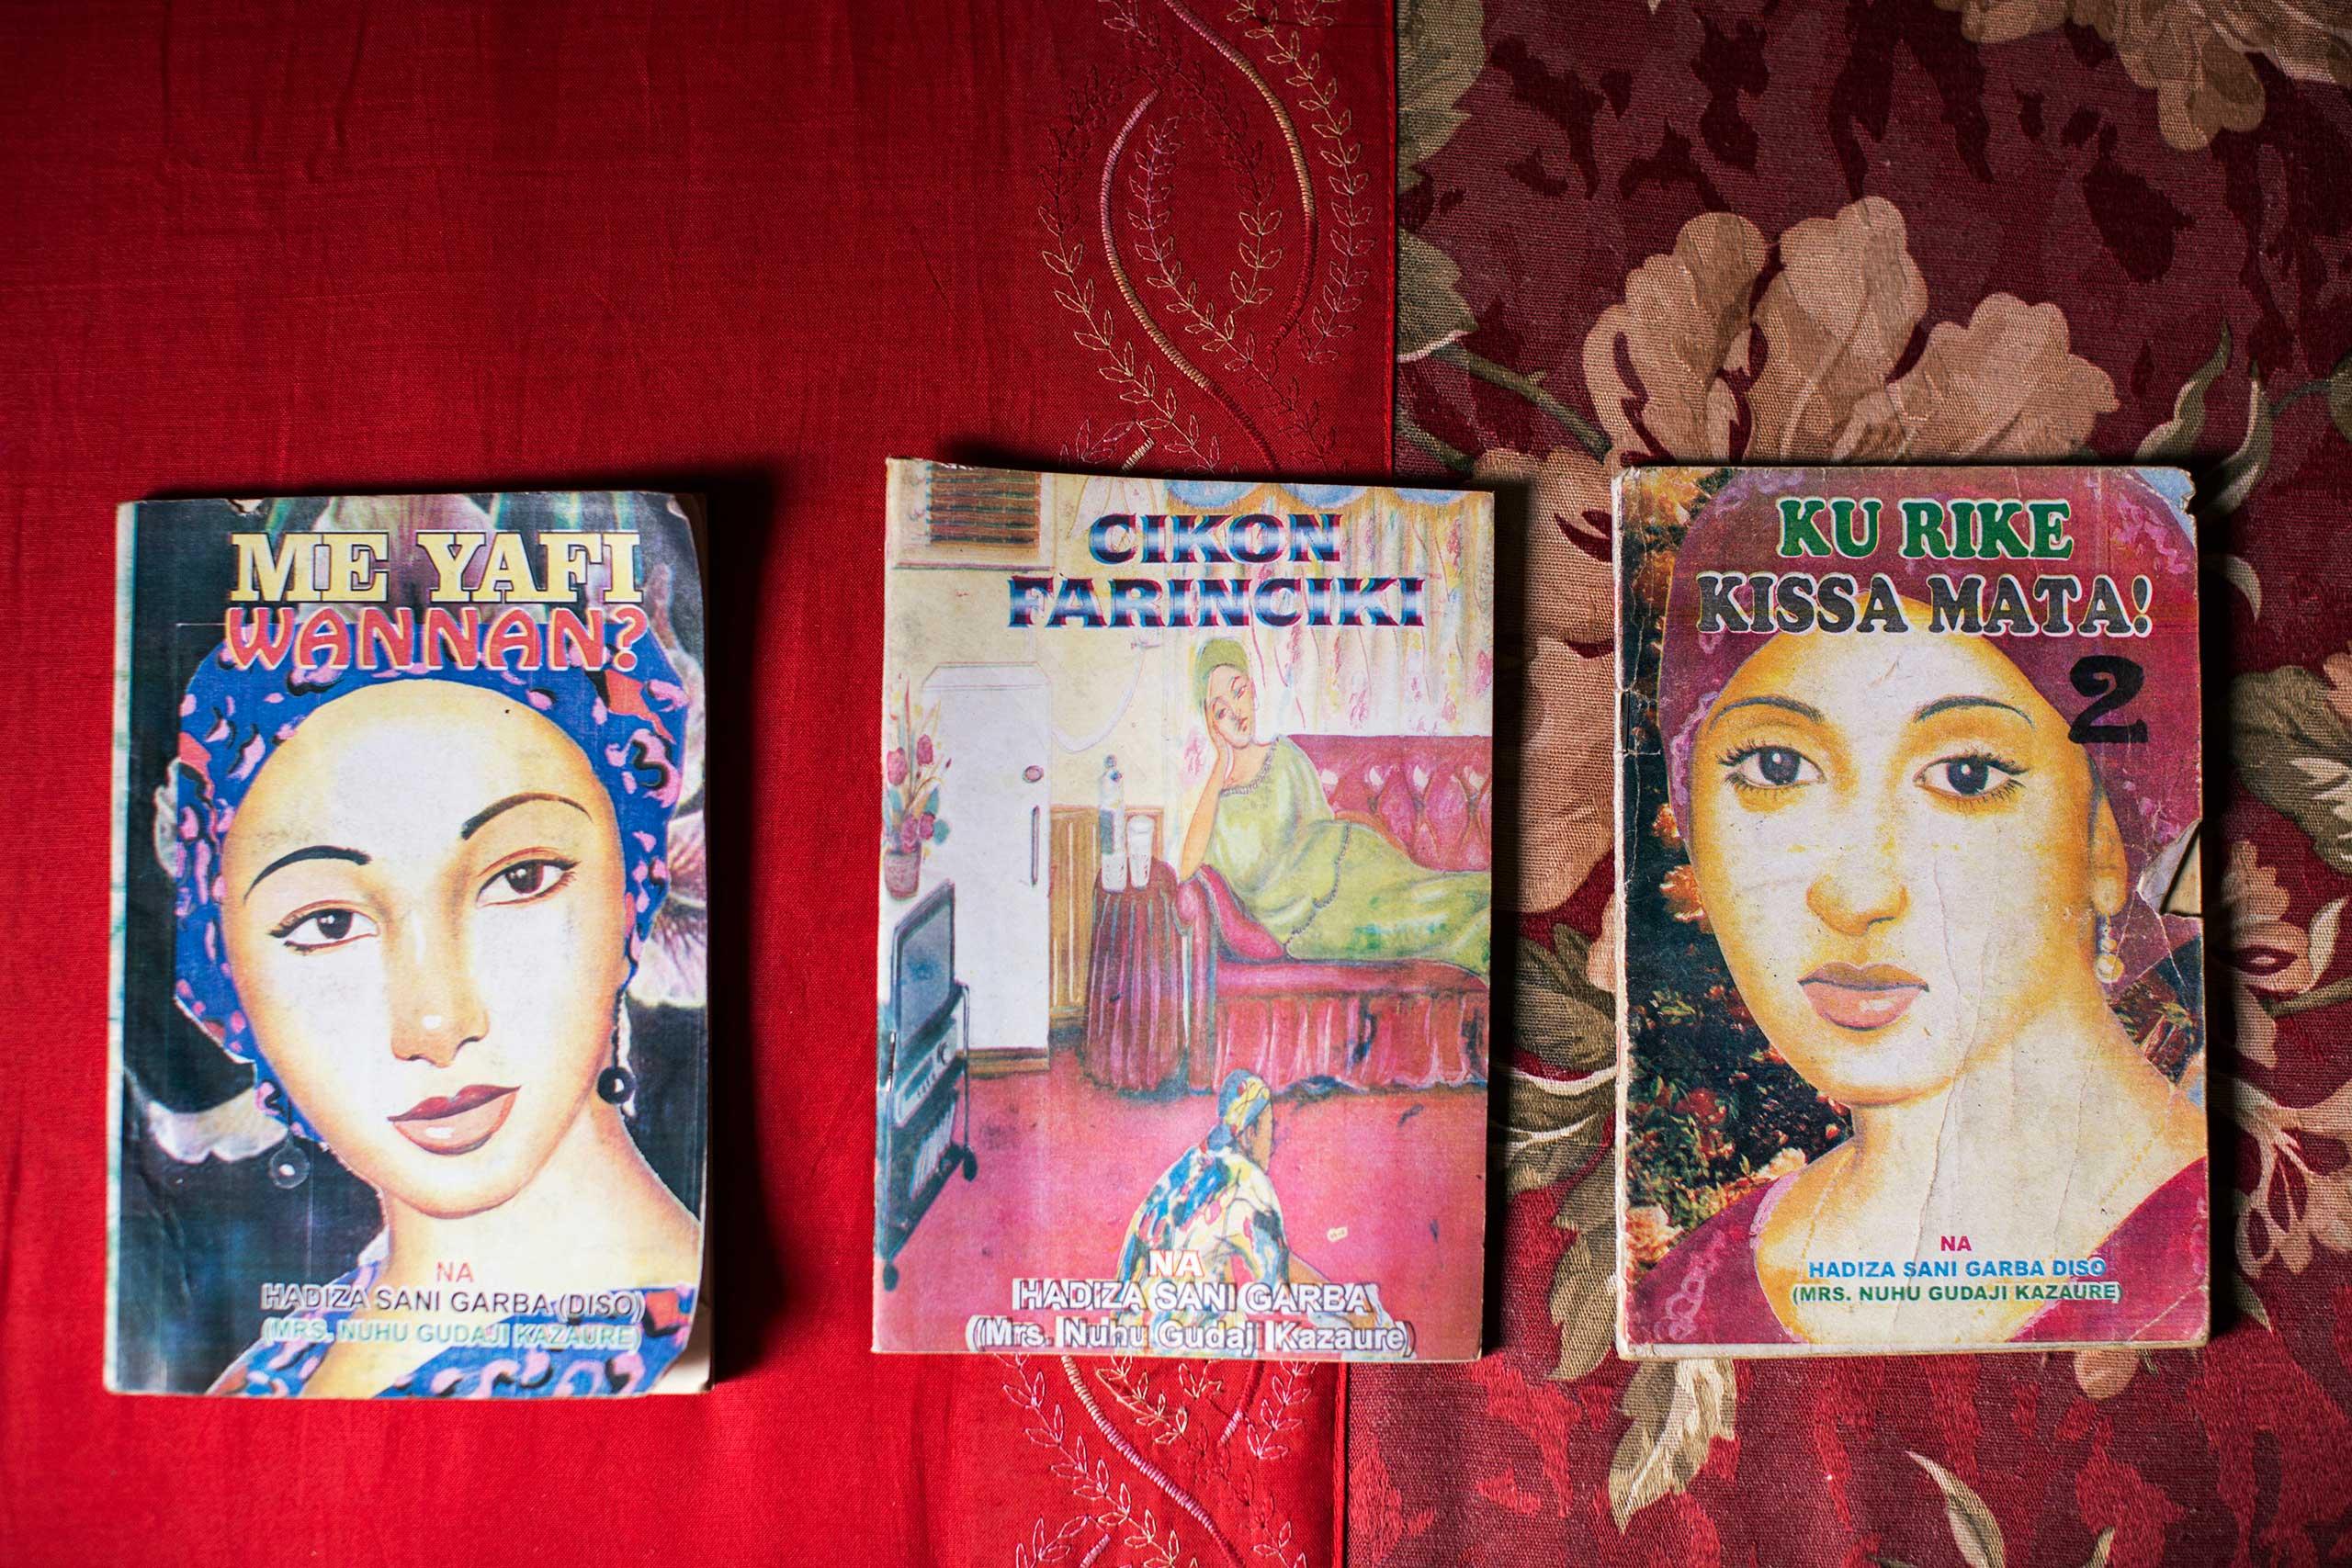 Three novels with hand drawn covers by Hadiza Garba, a popular novelist, Kano, Northern Nigeria, April 10, 2013.